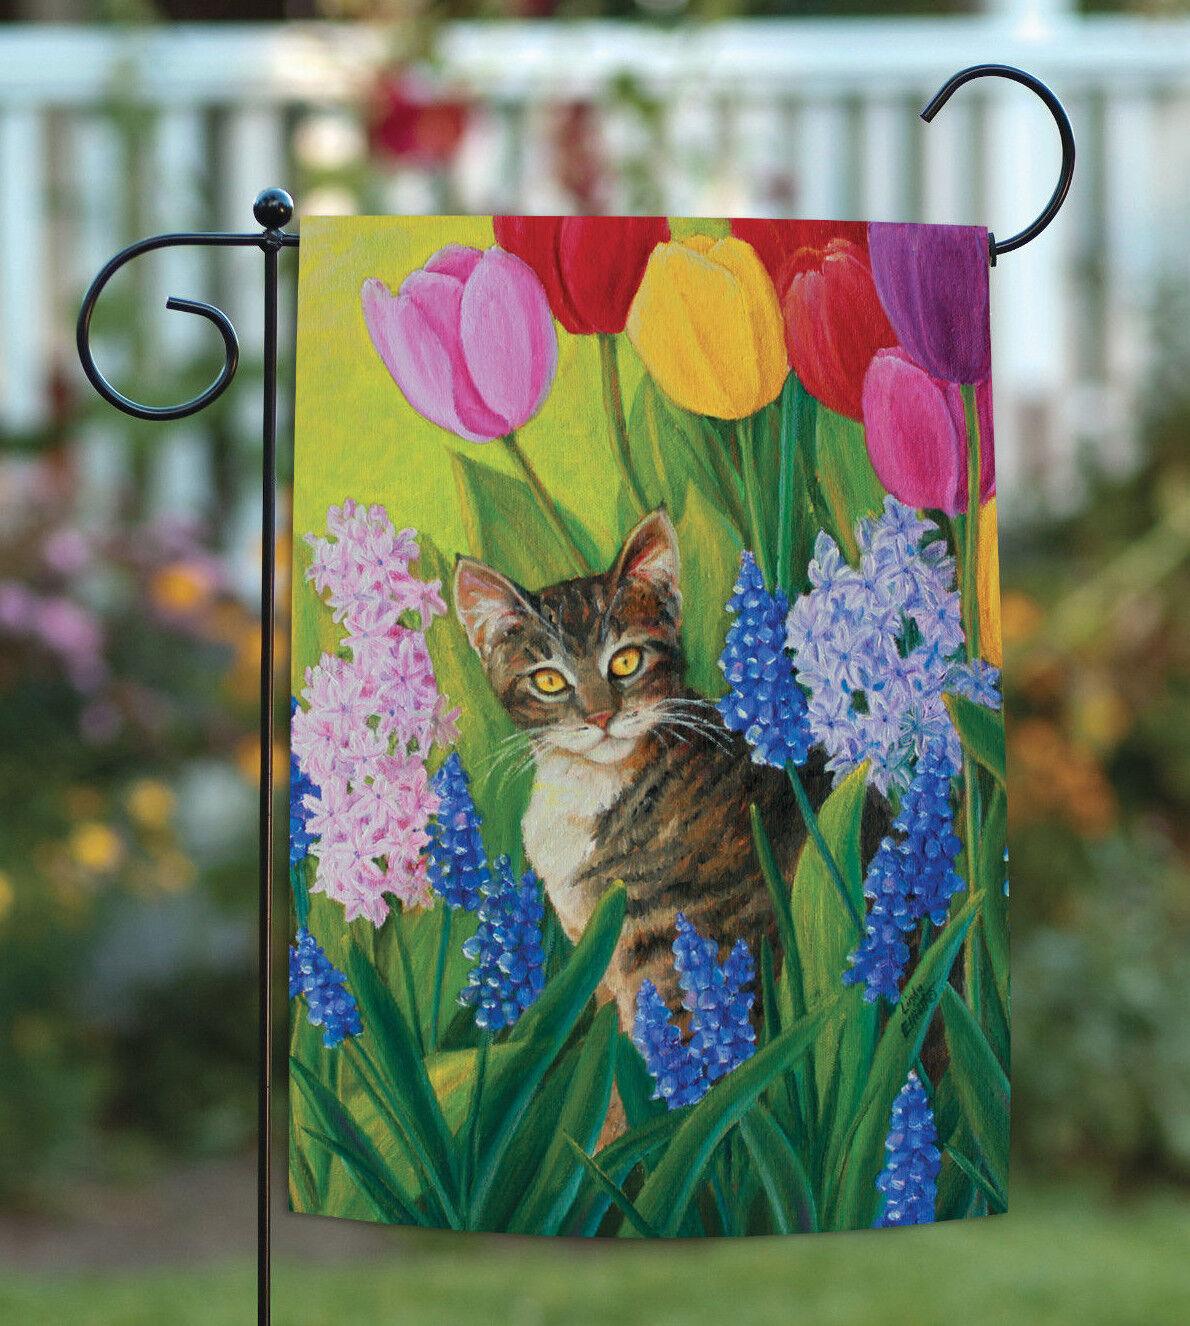 Toland Spring Garden Flag Tomcat Tulips Golden Eyed Cat 12 5x18 For Sale Online Ebay